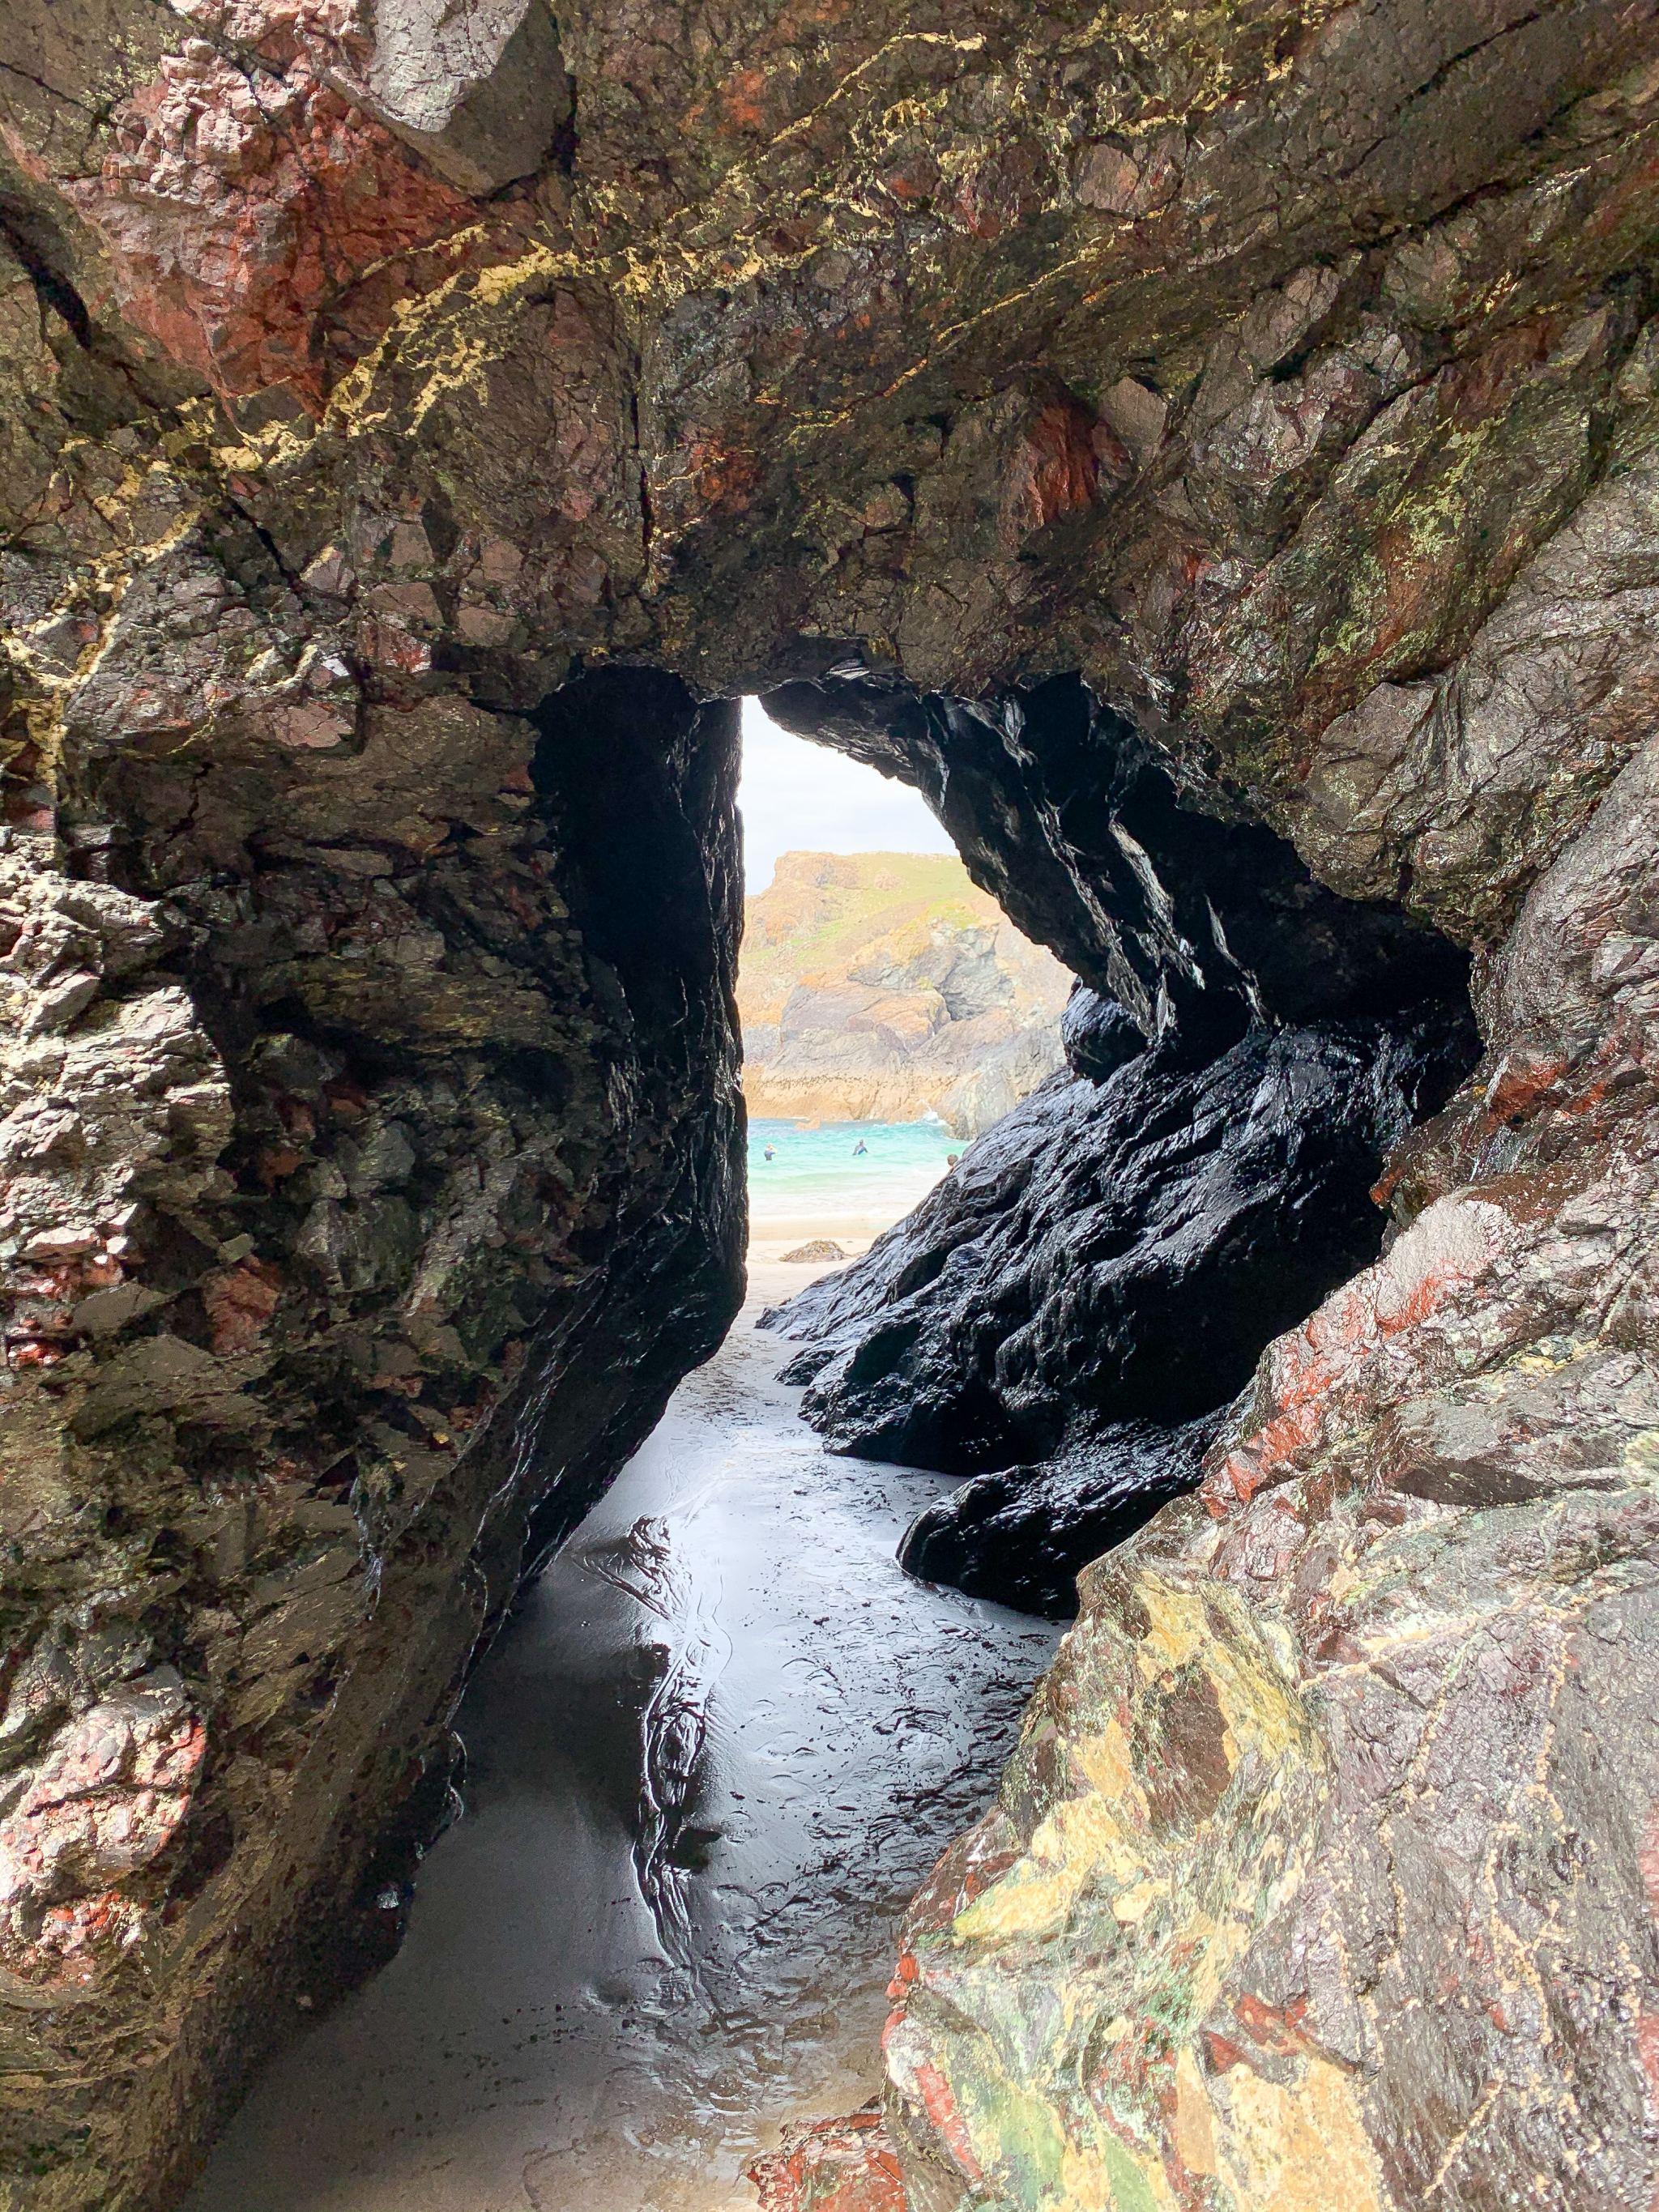 Kynance Cove caves